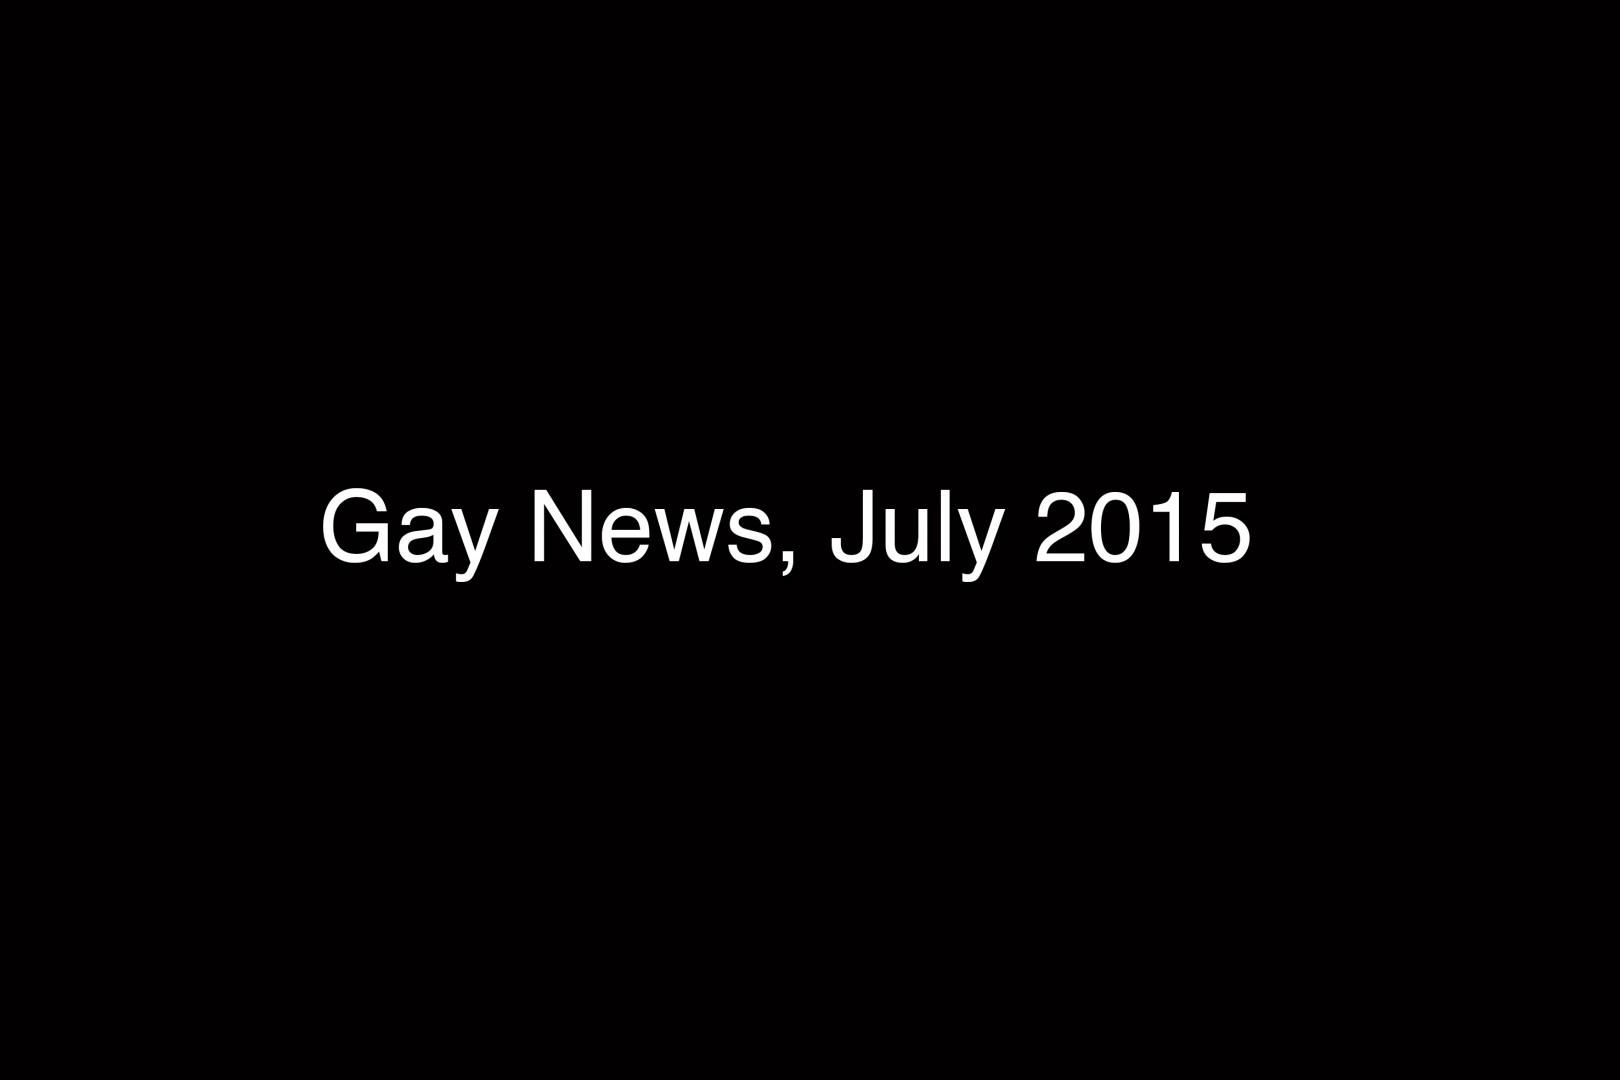 Gay_News